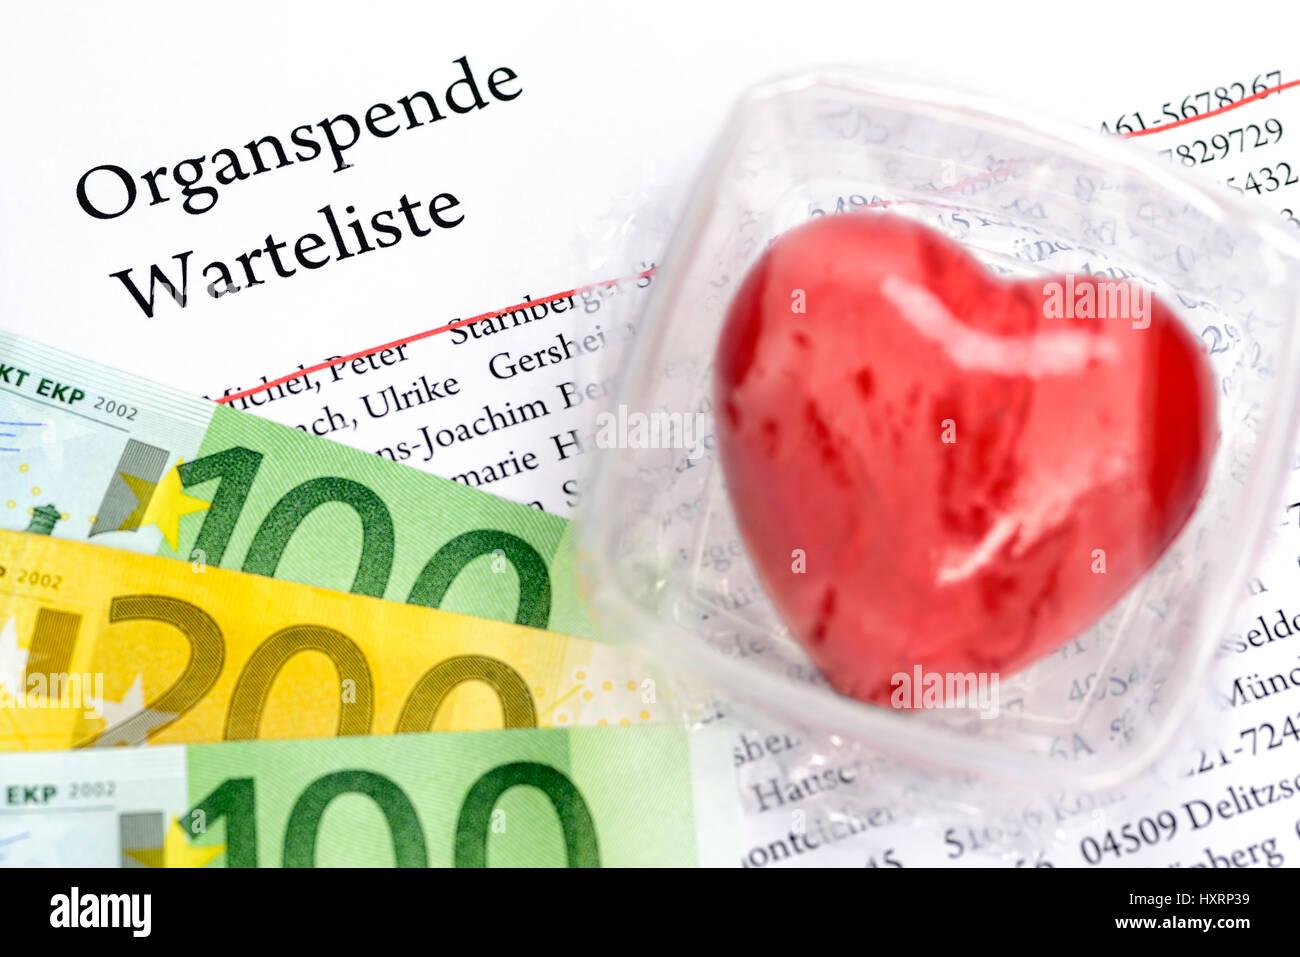 Heart in fresh hold box and organ donation vantage point list, symbolic photo organ donation, Herz in Frischhaltebox - Stock Image